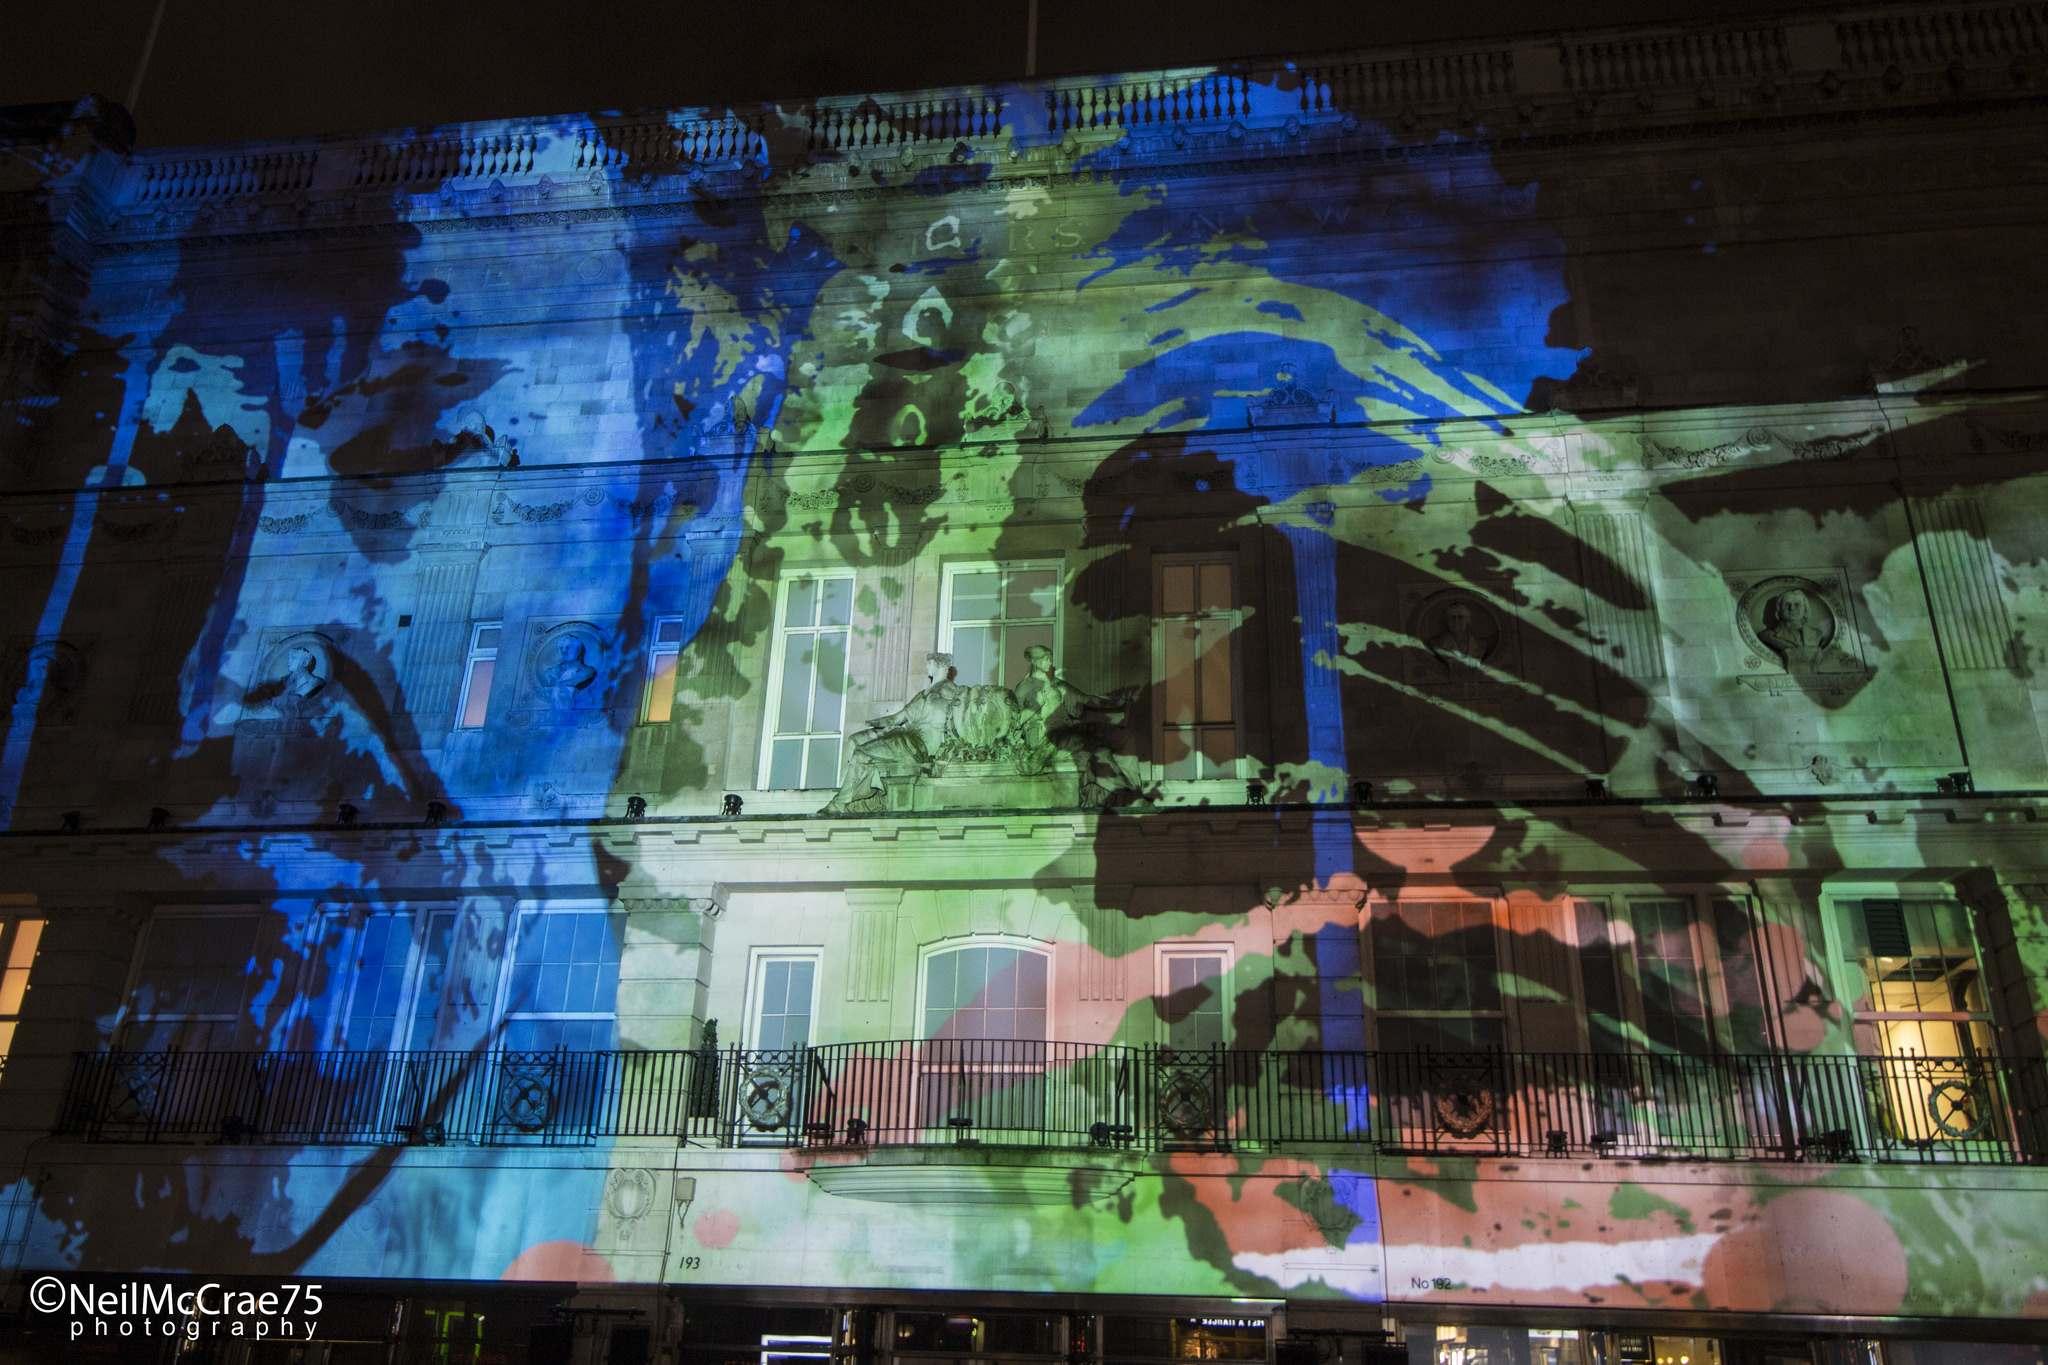 london lumiere festival9 The London Light Lumiere Festival by Neil McCrae